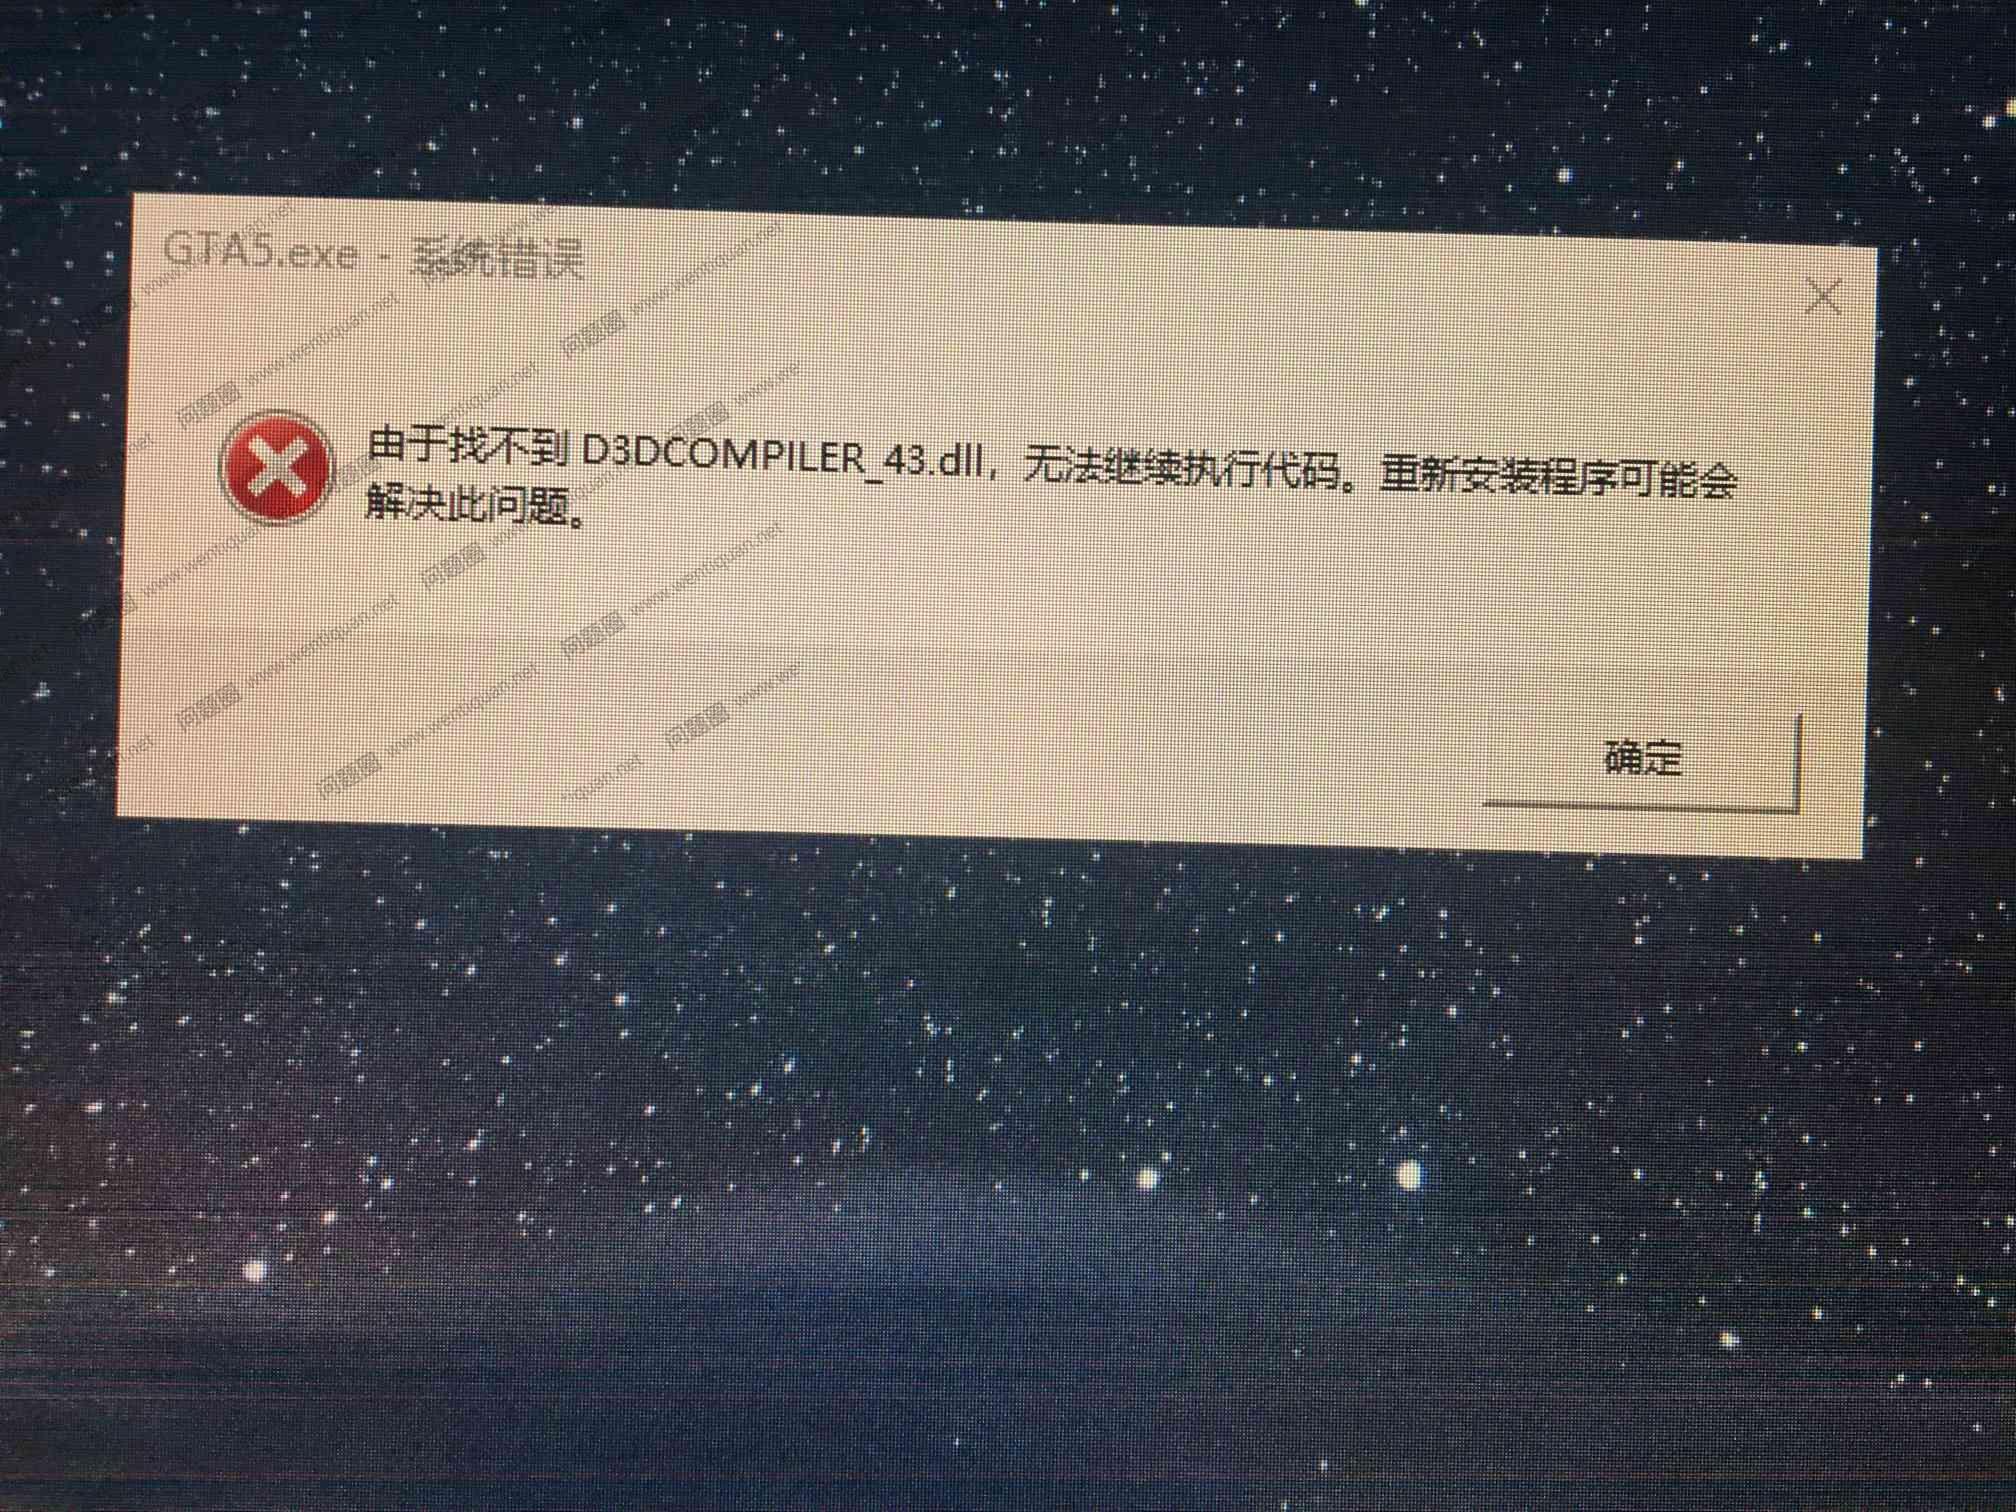 qq游戏安装后打不开_GTA5.exe系统错误,找不到D3DCOMPILER-43.DLL,R星无法执行错误代码重新 ...